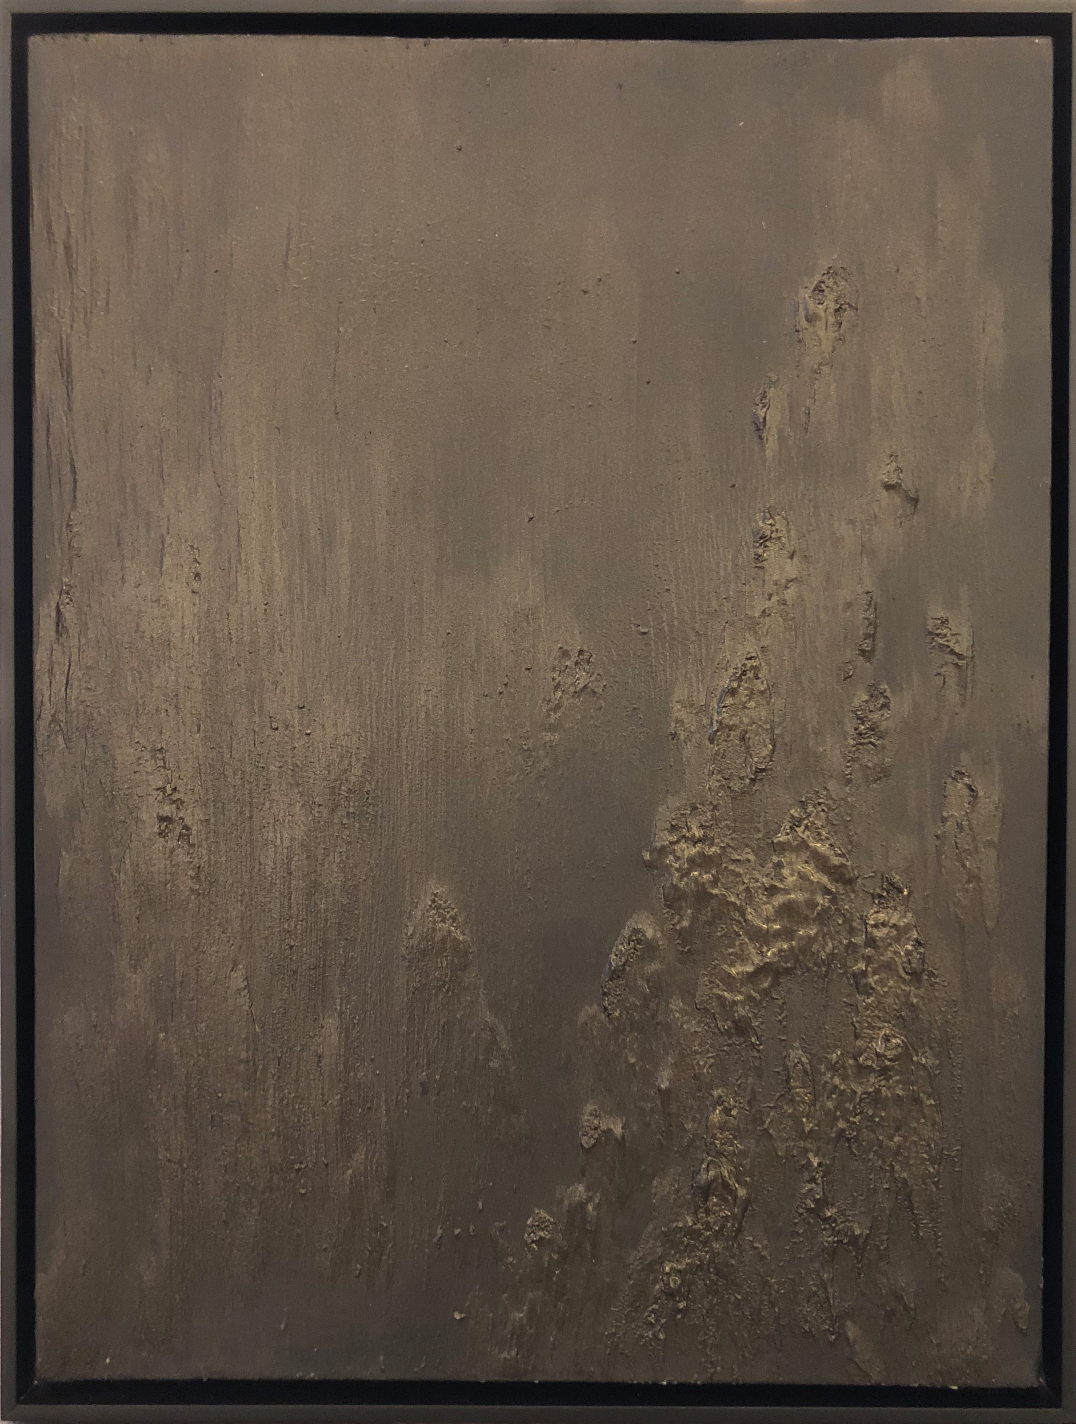 Matthew C. Metzger, American Darkness III  Oil, Iron & Bronze on Canvas, 25x19 in.